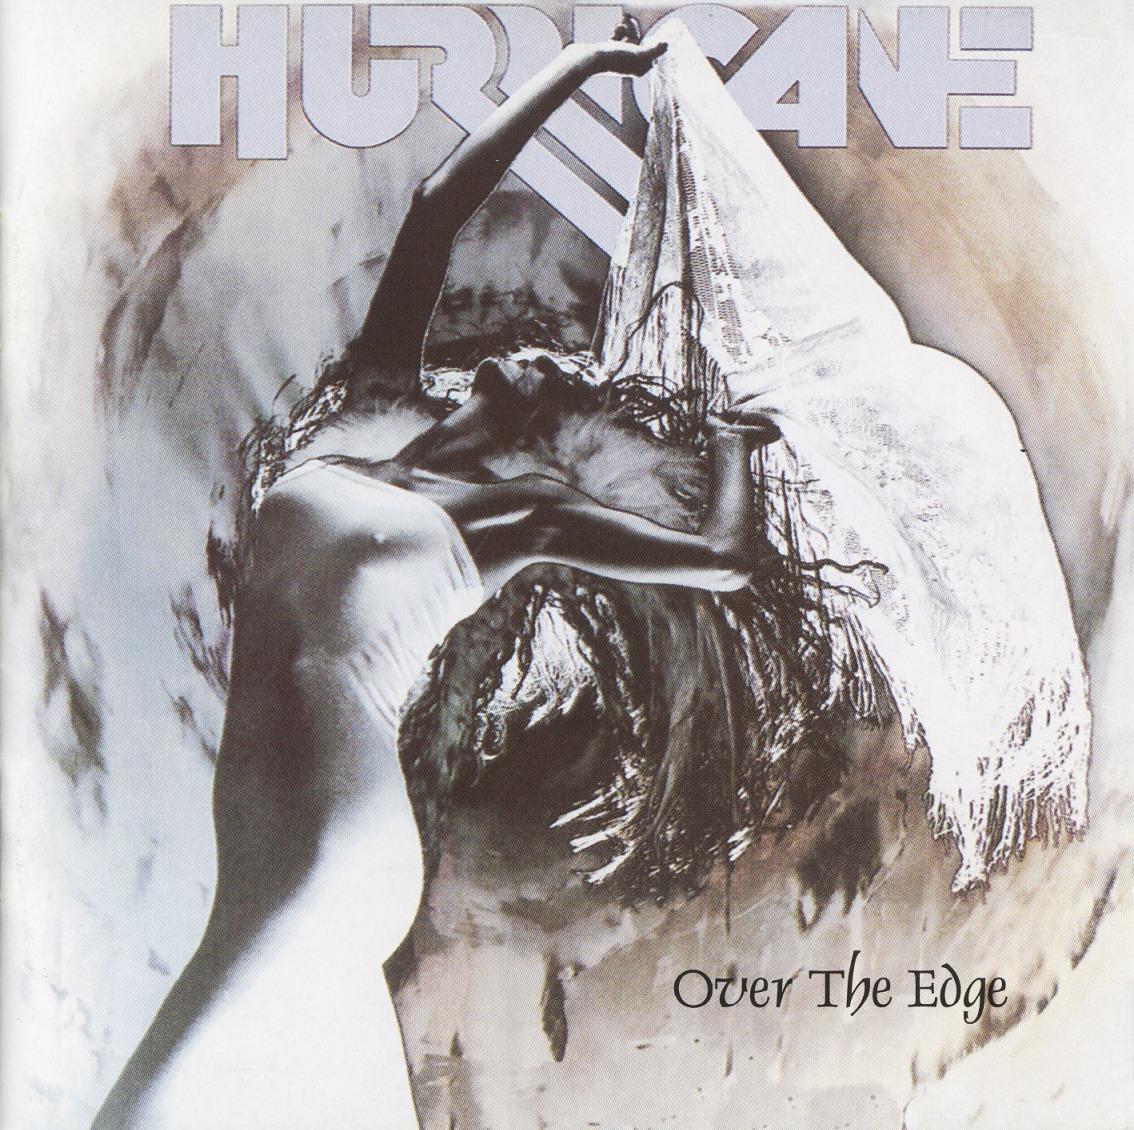 HURRICANE (US) / Over The Edge